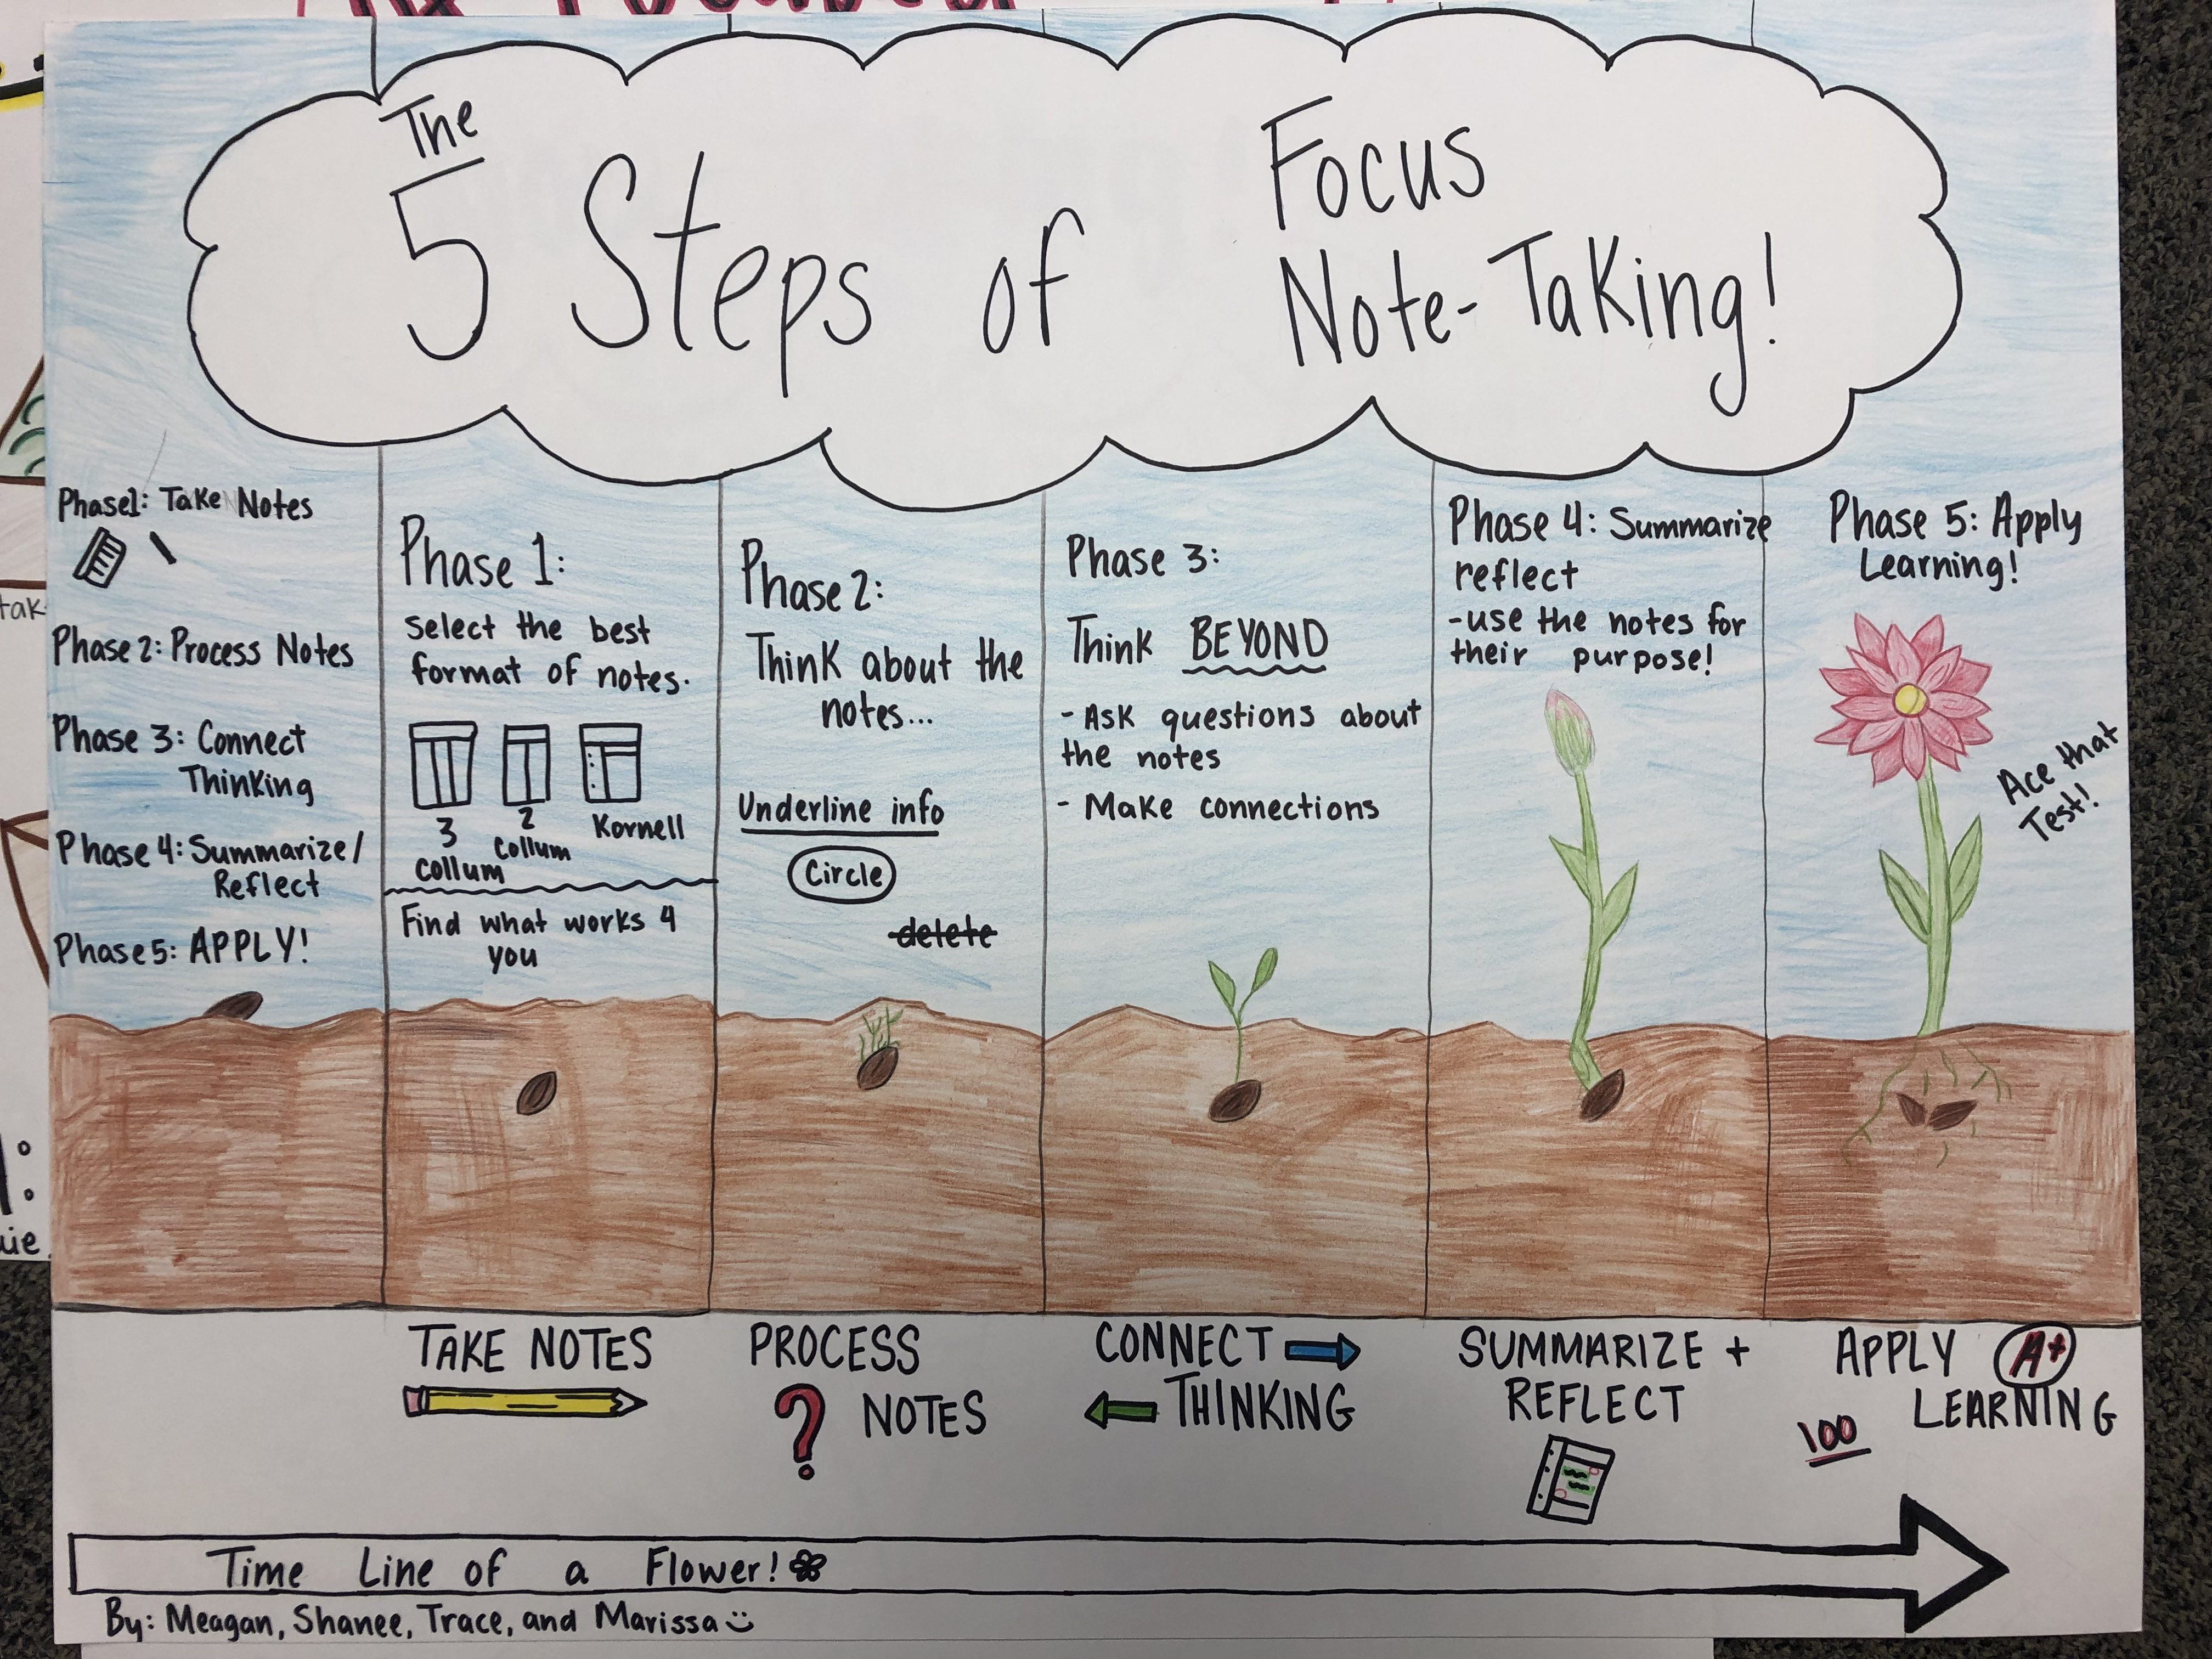 5 Steps of Focused Note Taking